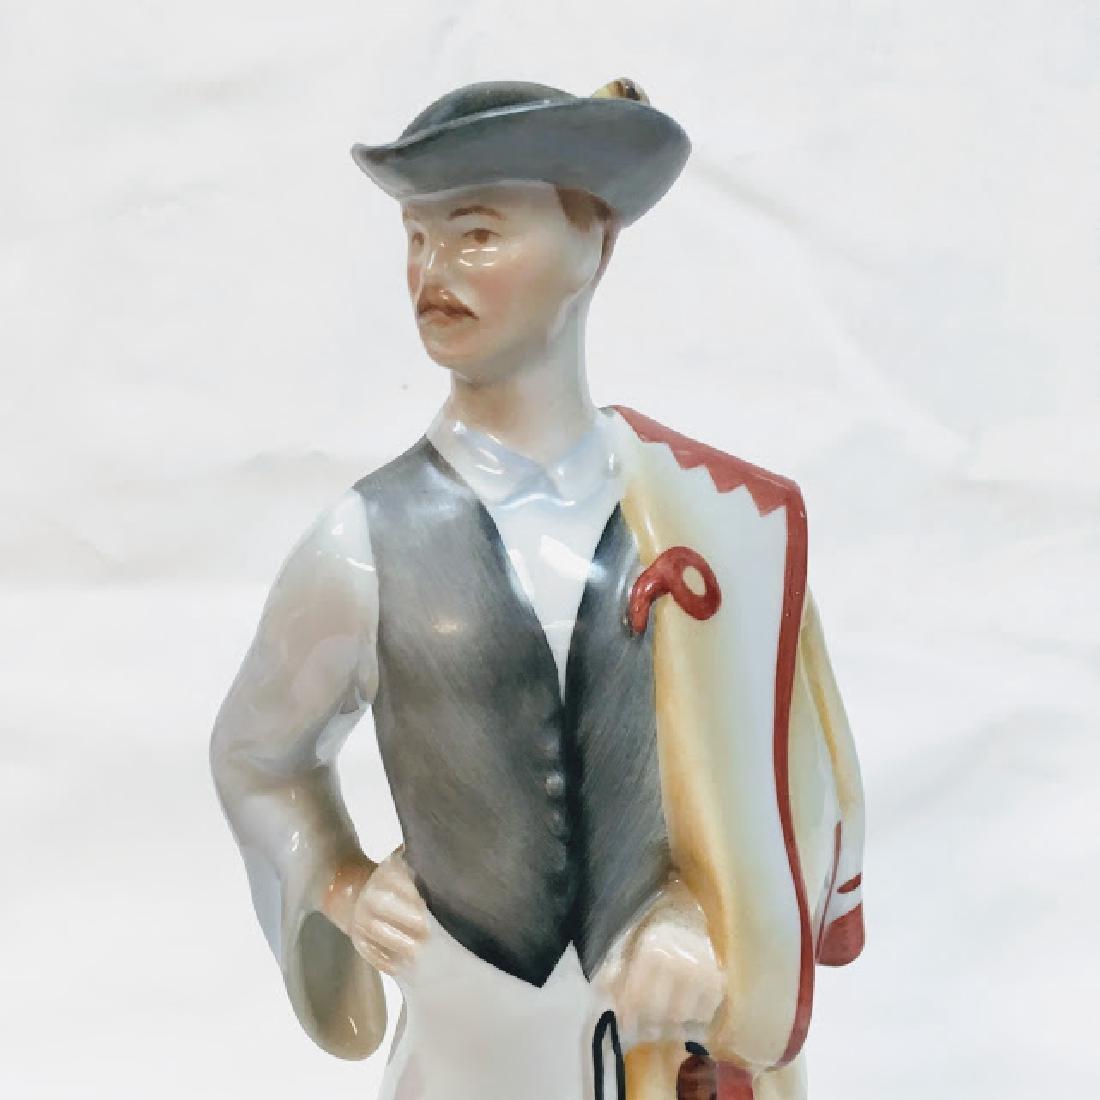 Kezifestes Budapest man in traditional costume figurine - 5